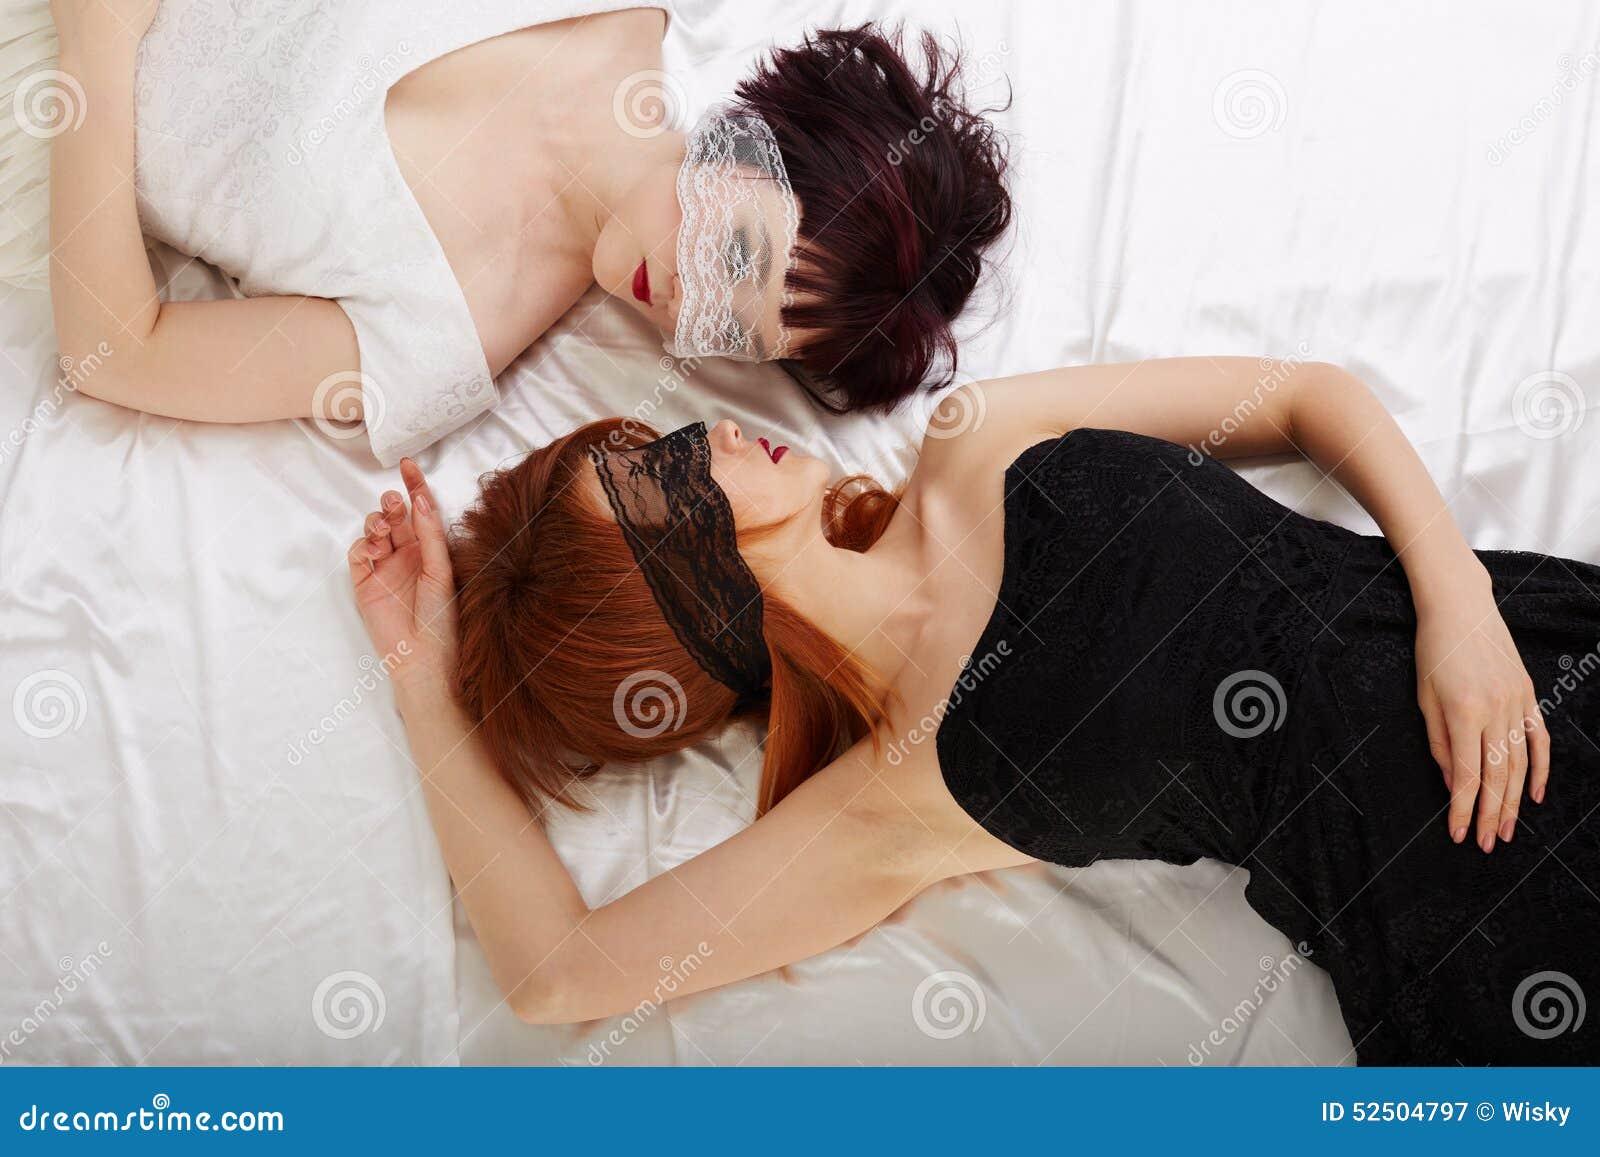 Seductive girls photos